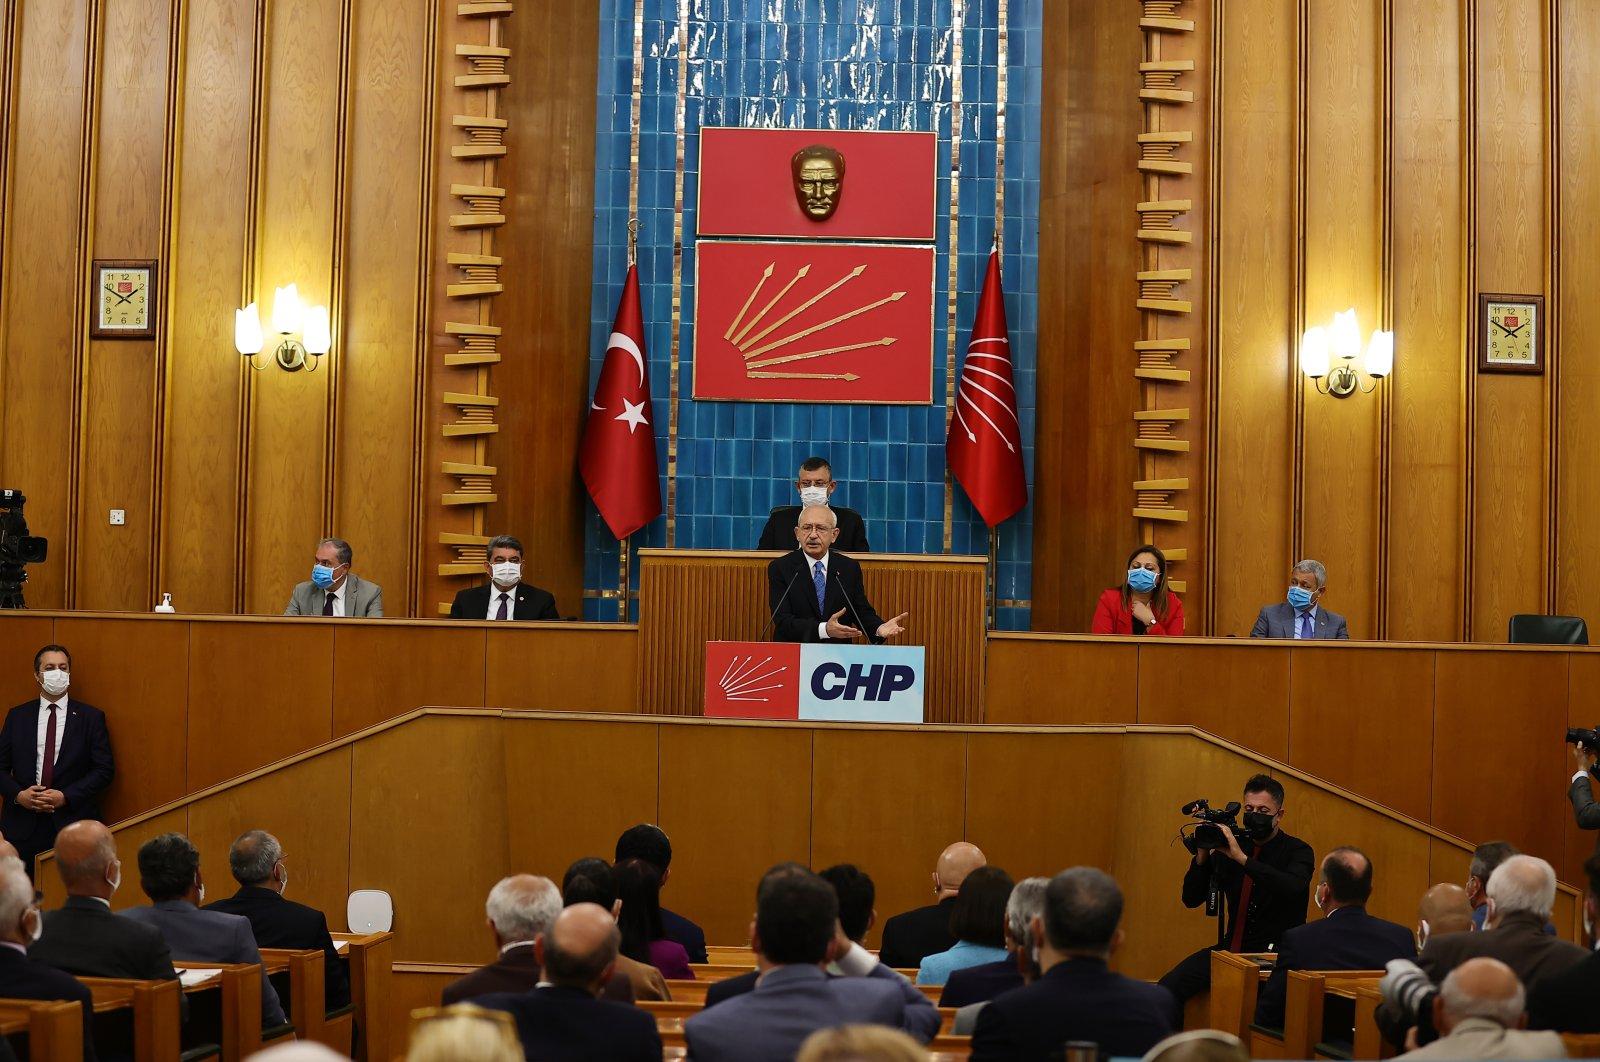 The main opposition Republican People's Party (CHP) leader Kemal Kılıçdaroğlu speaks during a party meeting in the Turkish Parliament, Ankara, Turkey, June 22, 2021. (AA Photo)